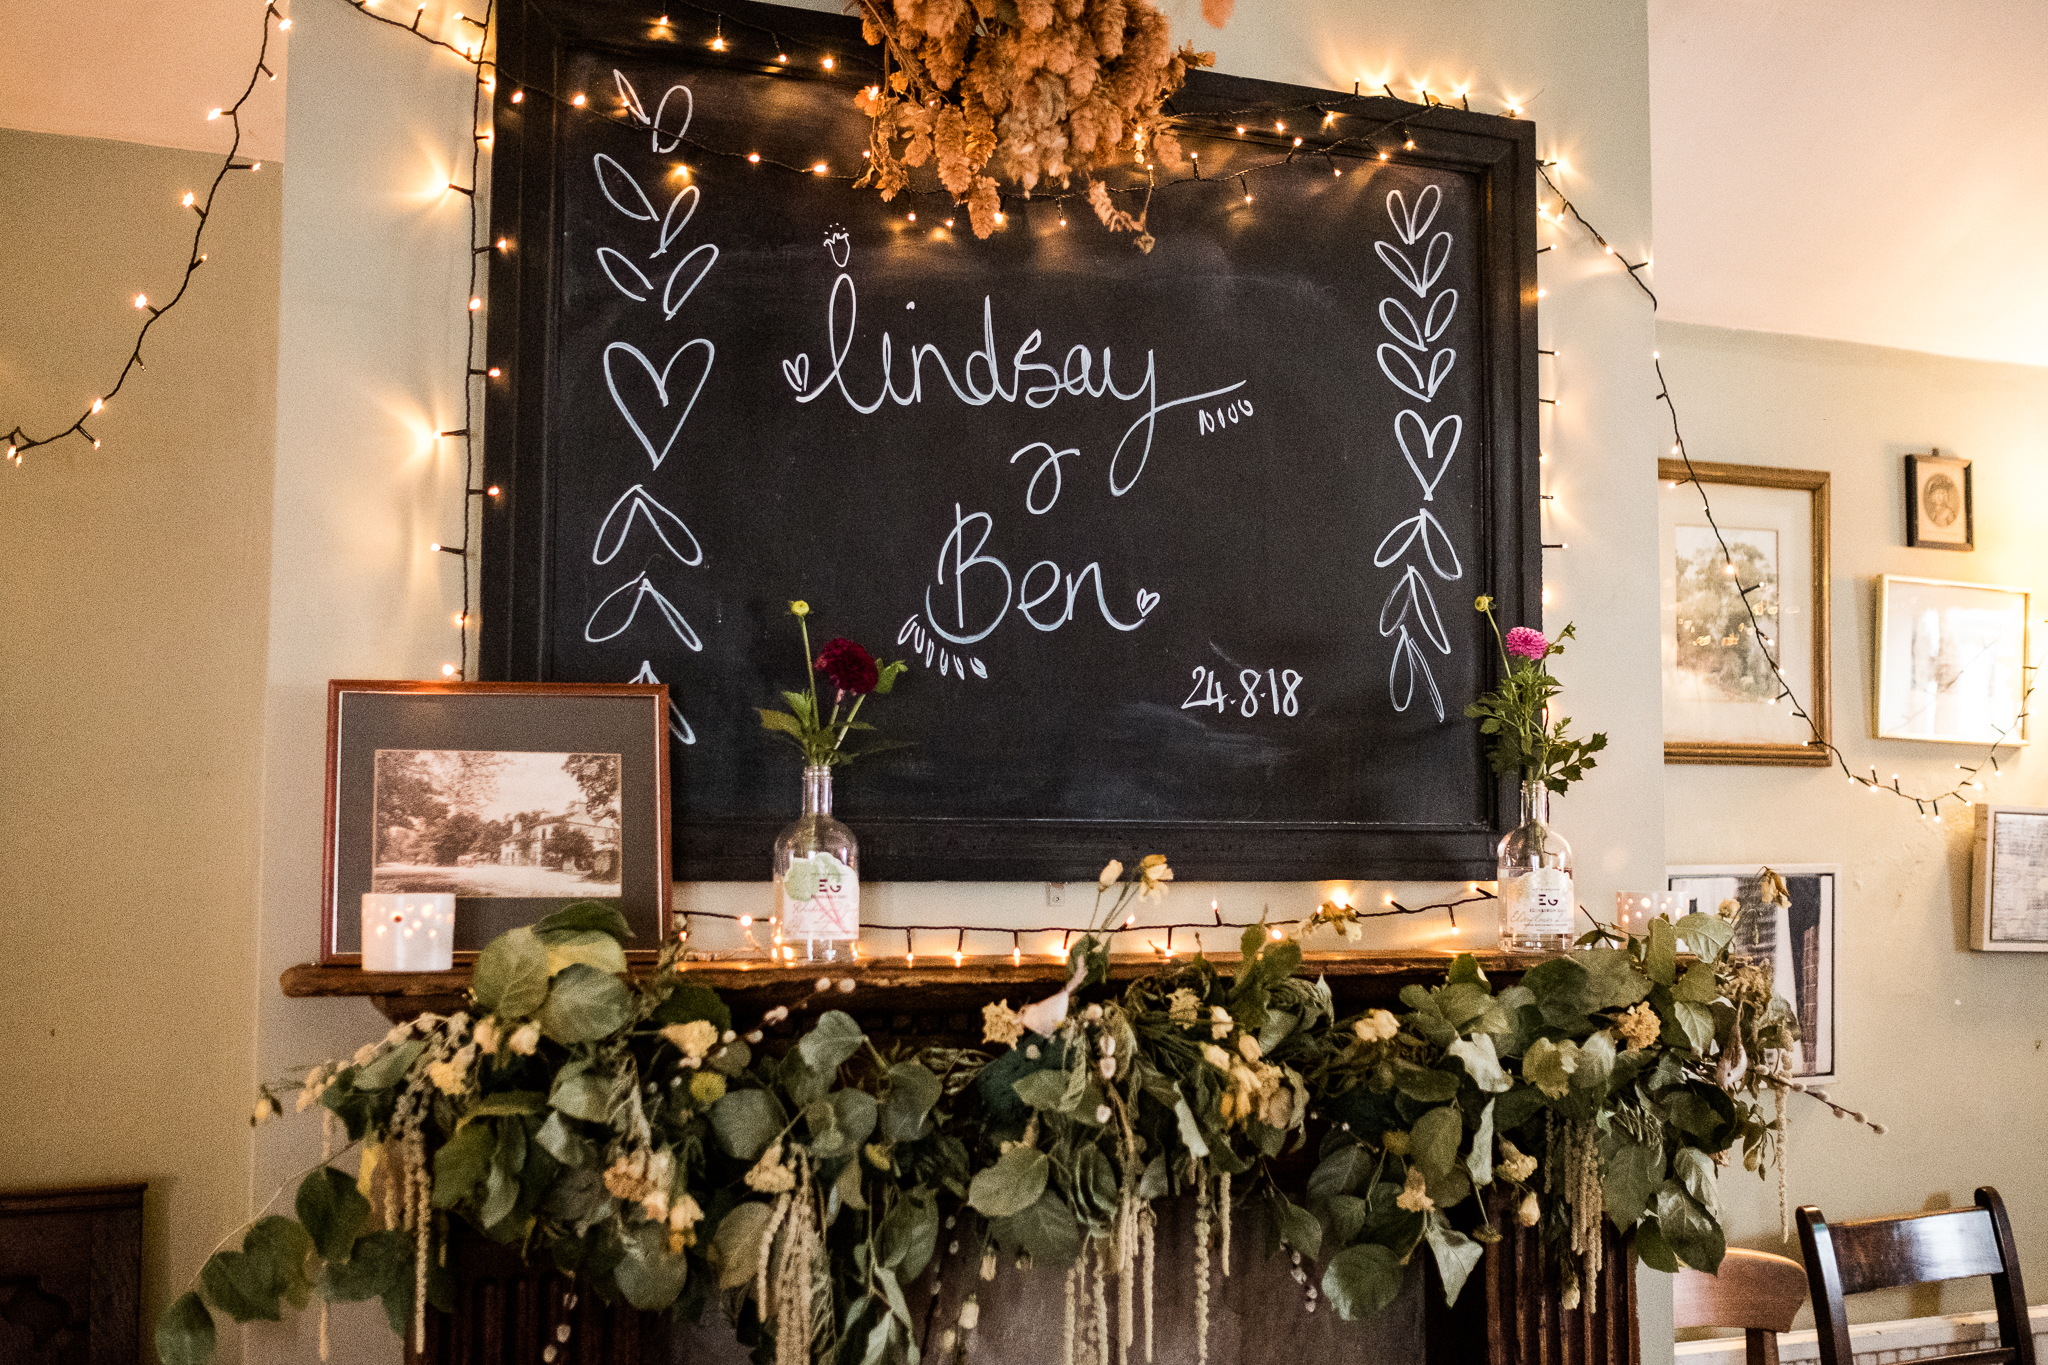 Relaxed Documentary Wedding Photography at The Wizard Inn, Alderley Edge Cheshire - Jenny Harper-53.jpg